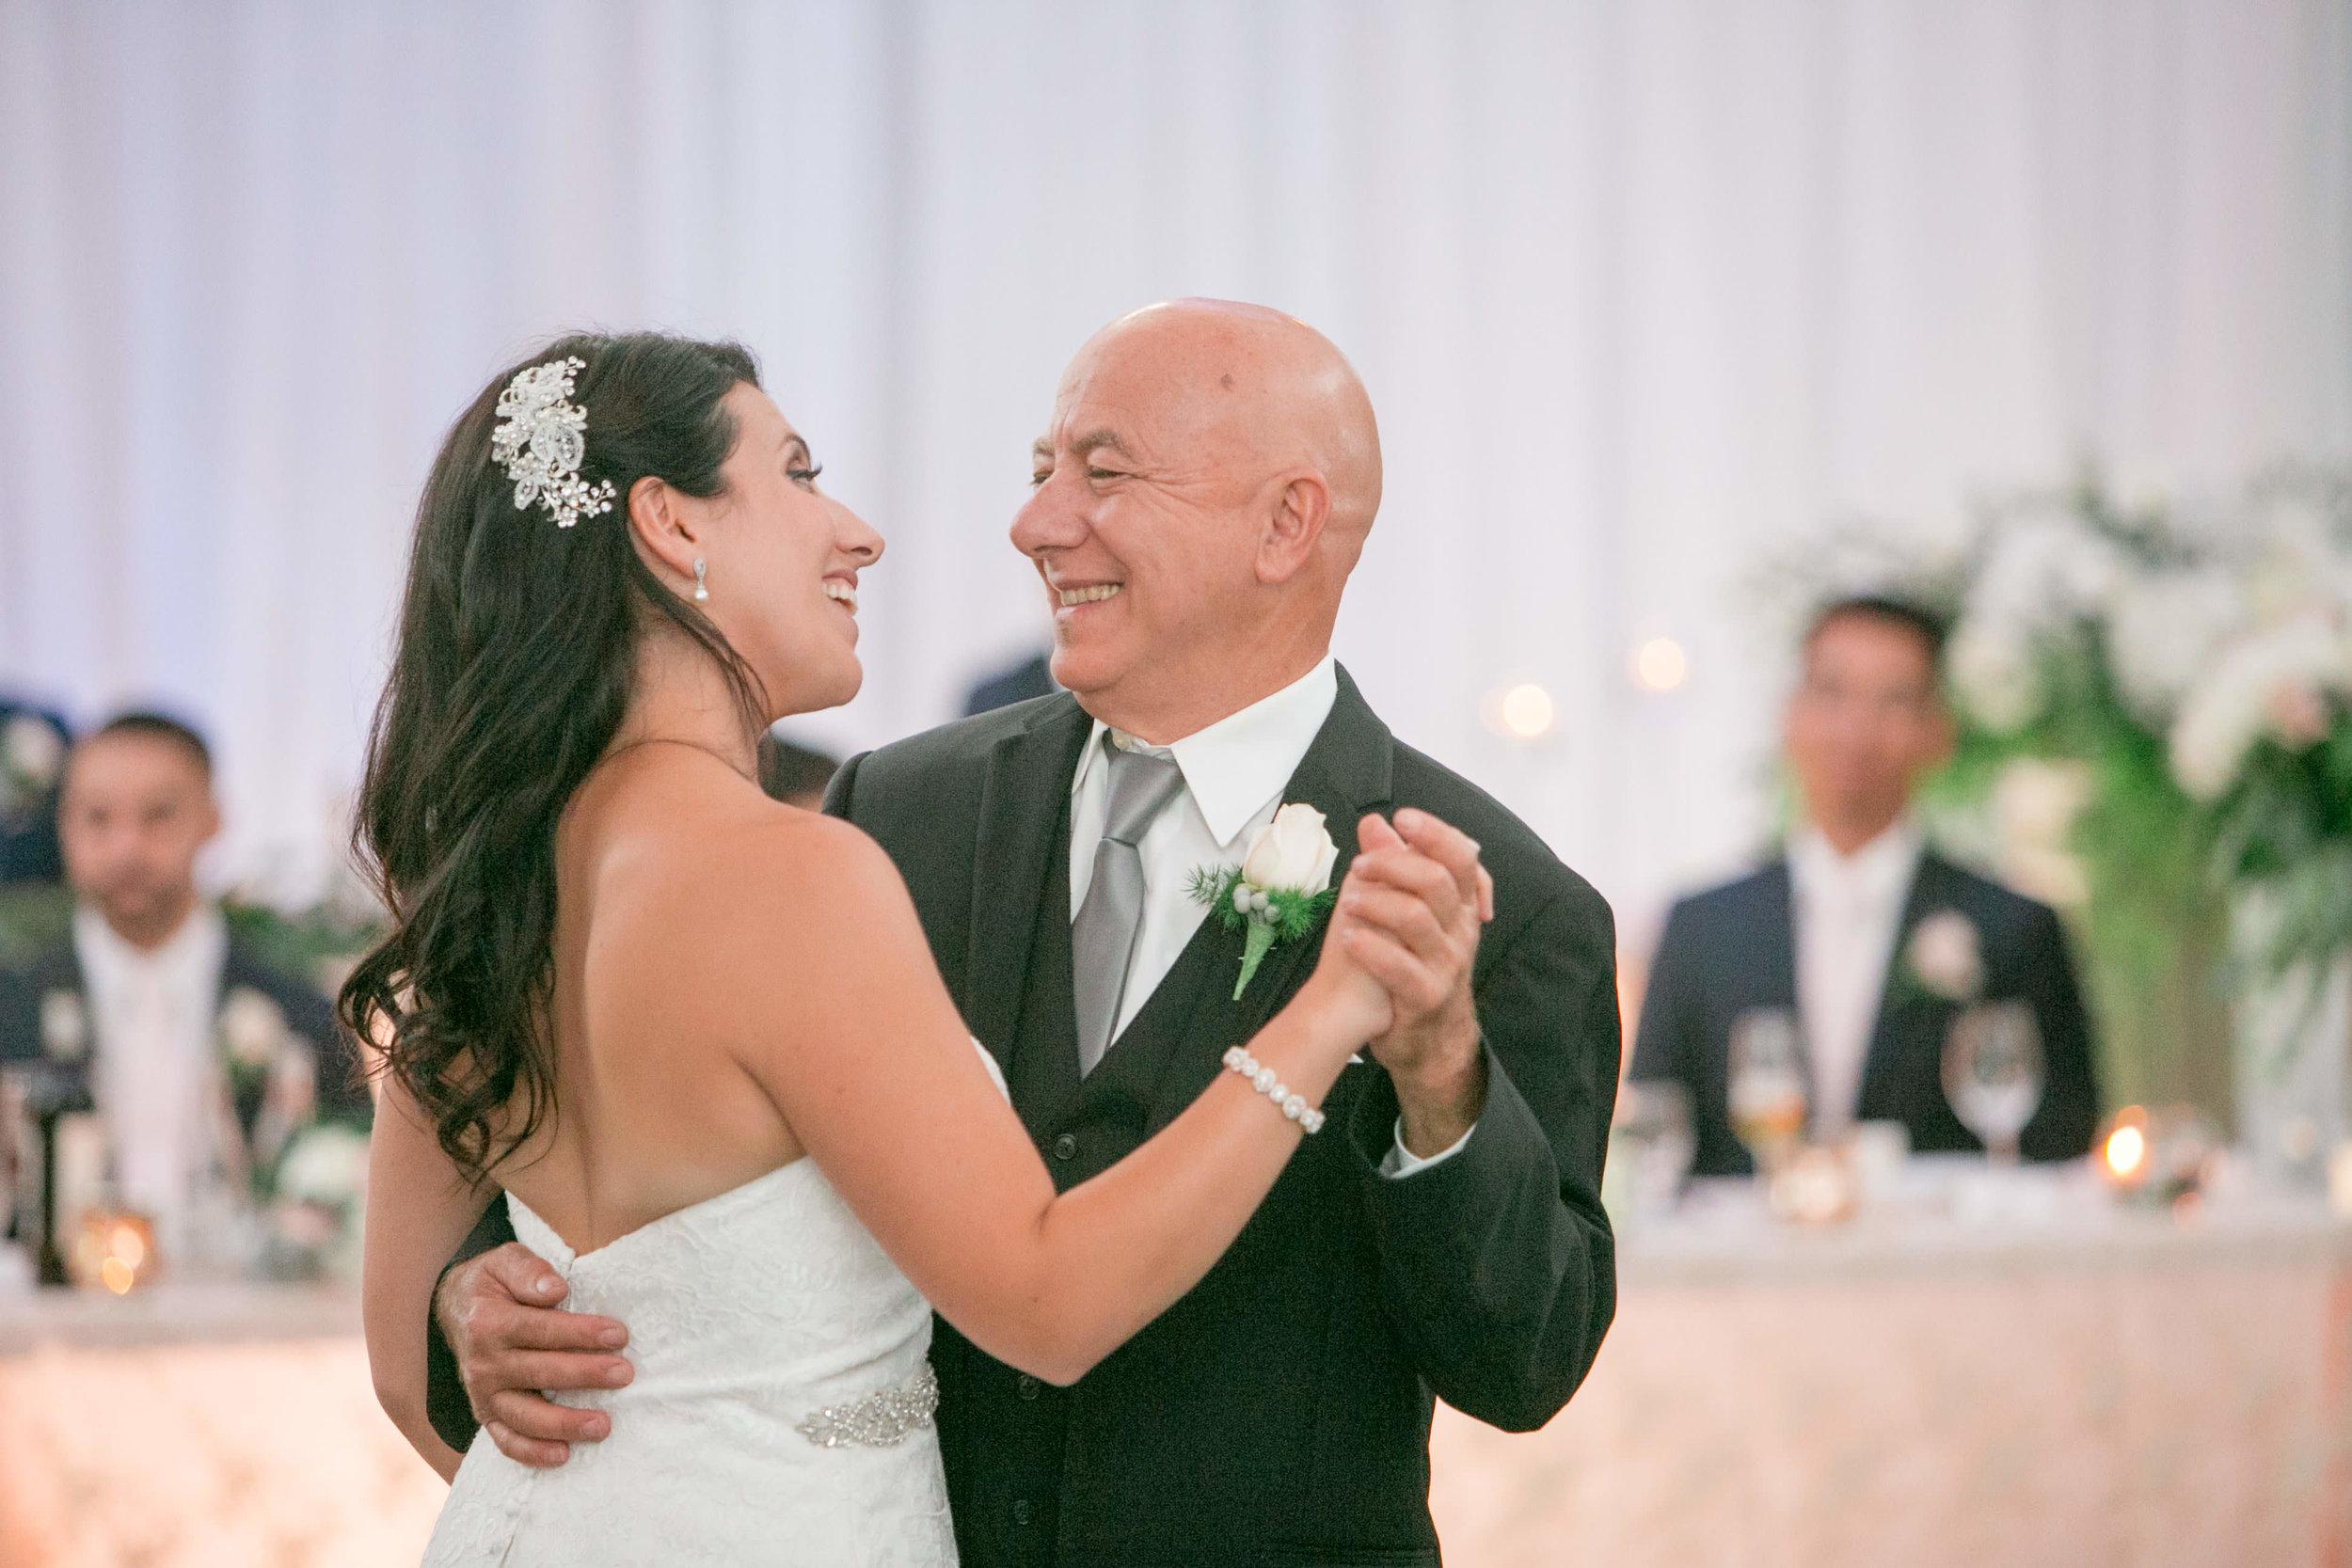 Stefanie___Bernard___Daniel_Ricci_Weddings_High_Res._Finals__582.jpg